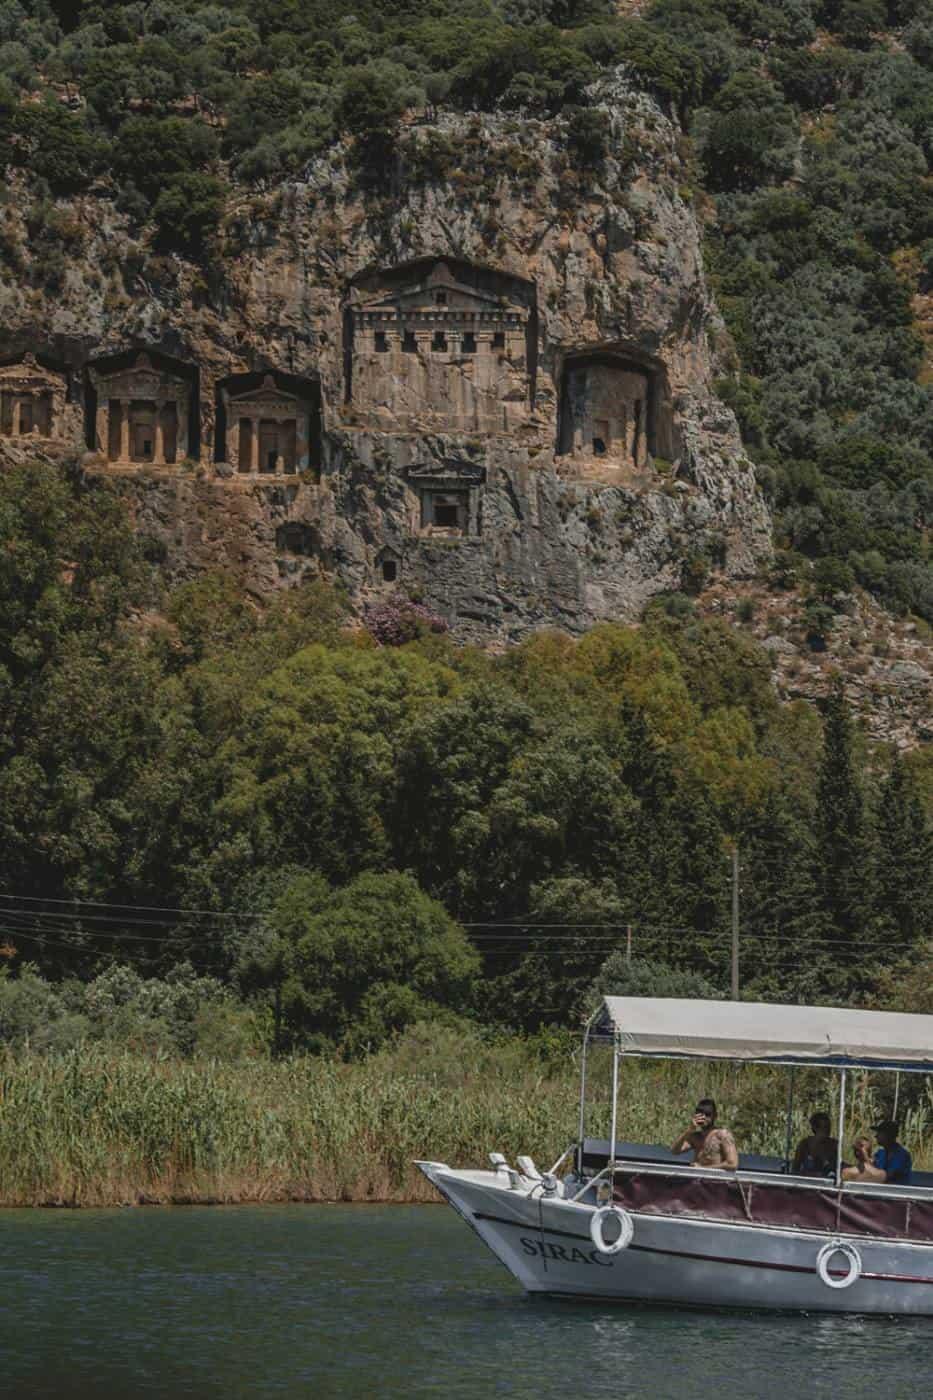 Caves in Dalyan River in Marmaris Turkey